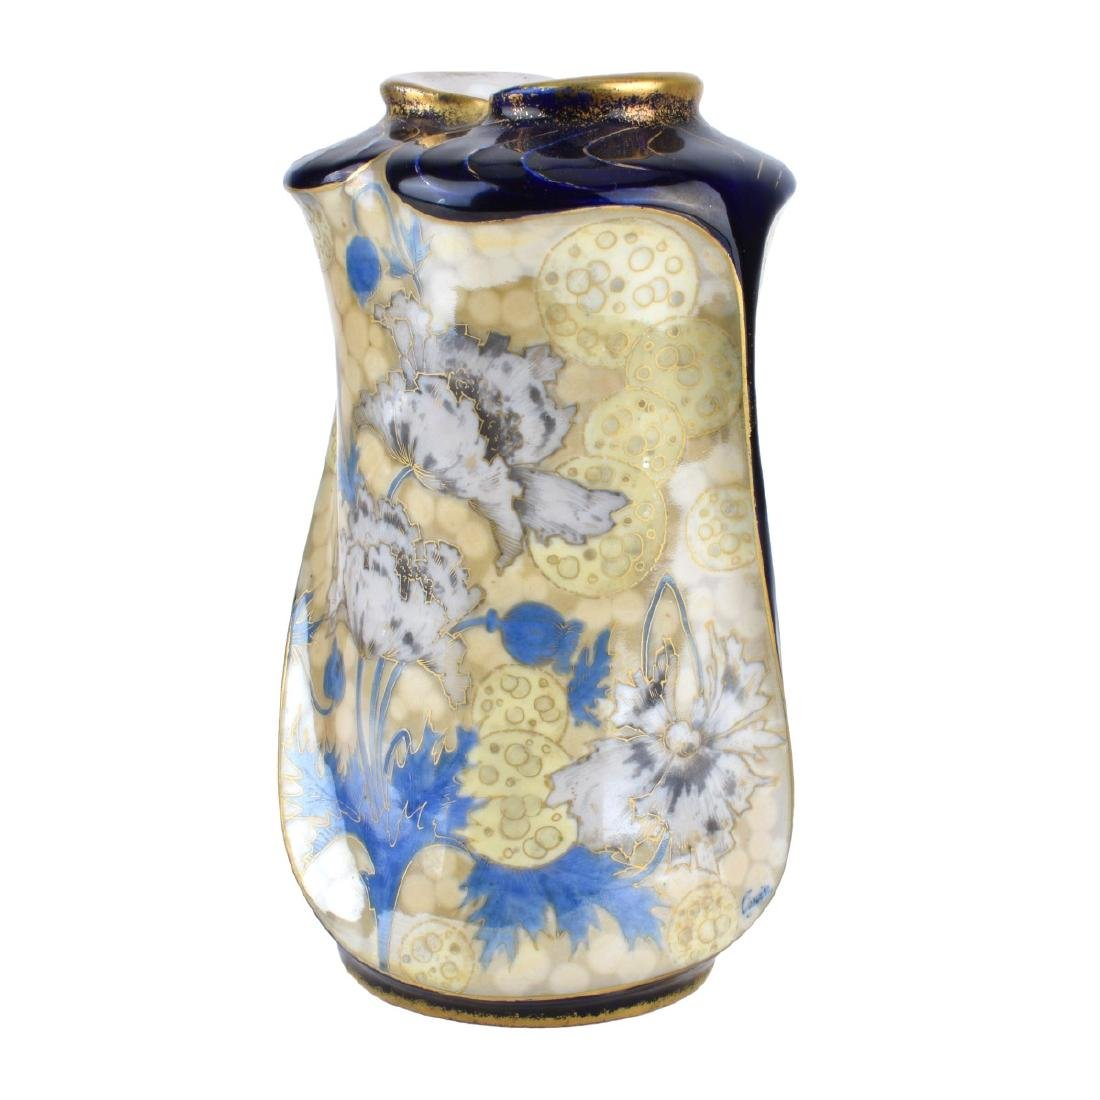 "Turn Teplitz Amphora ""Osiris"" Vase"